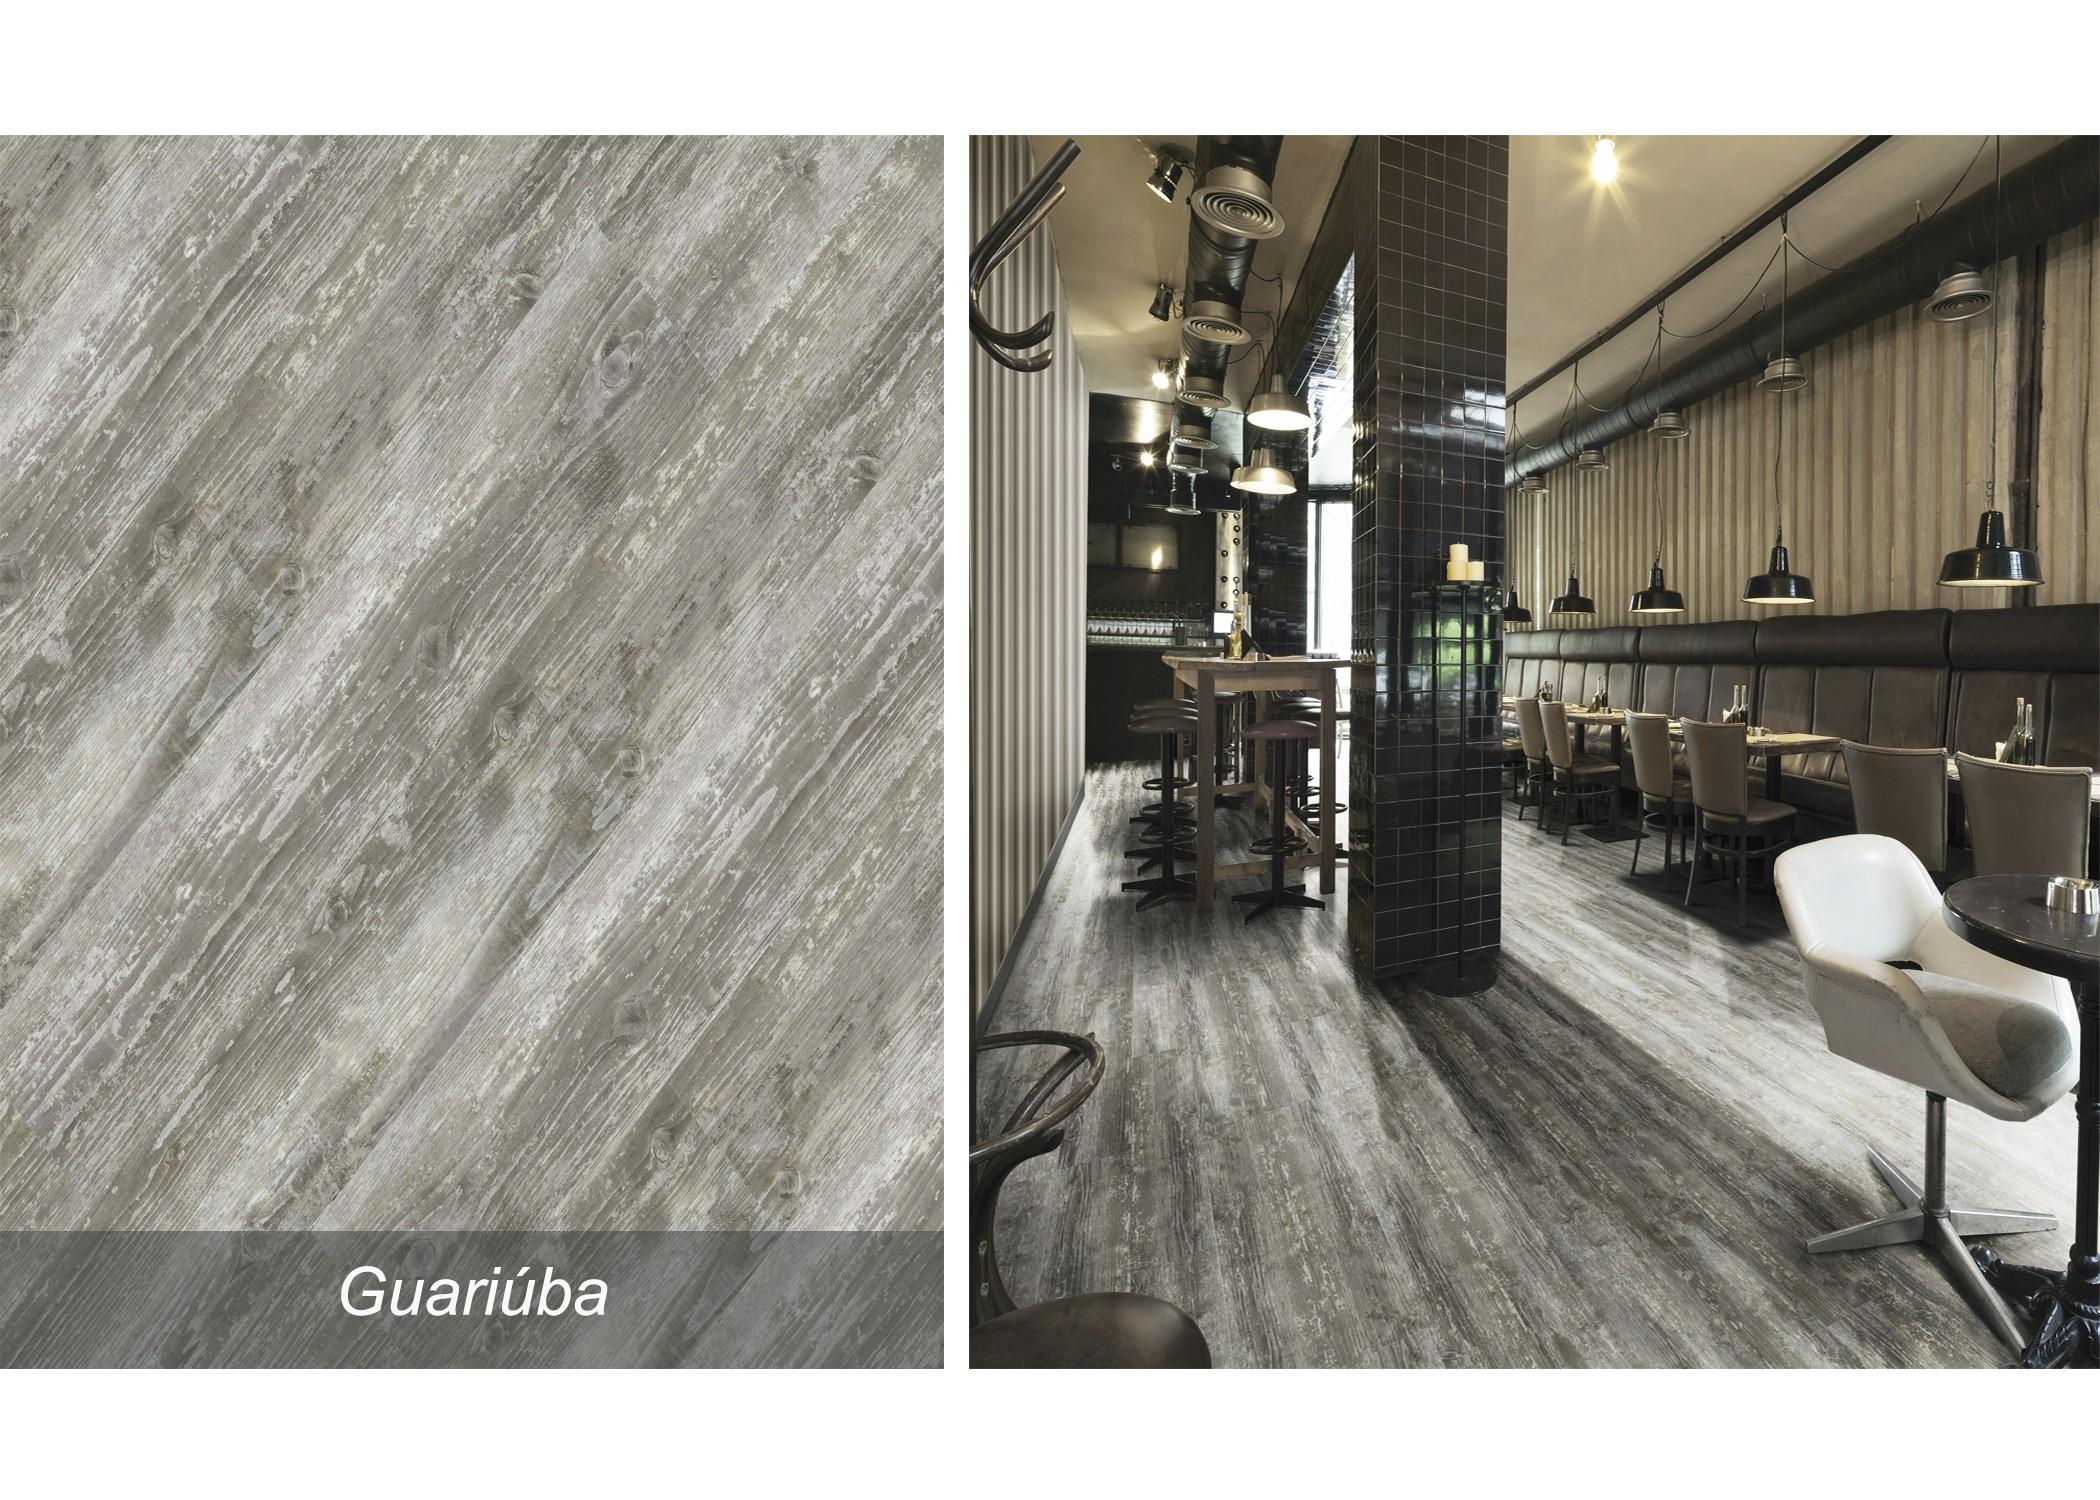 Piso Vin Lico Ambienta Studio Design Guari Ba Tarkett M Tarkett